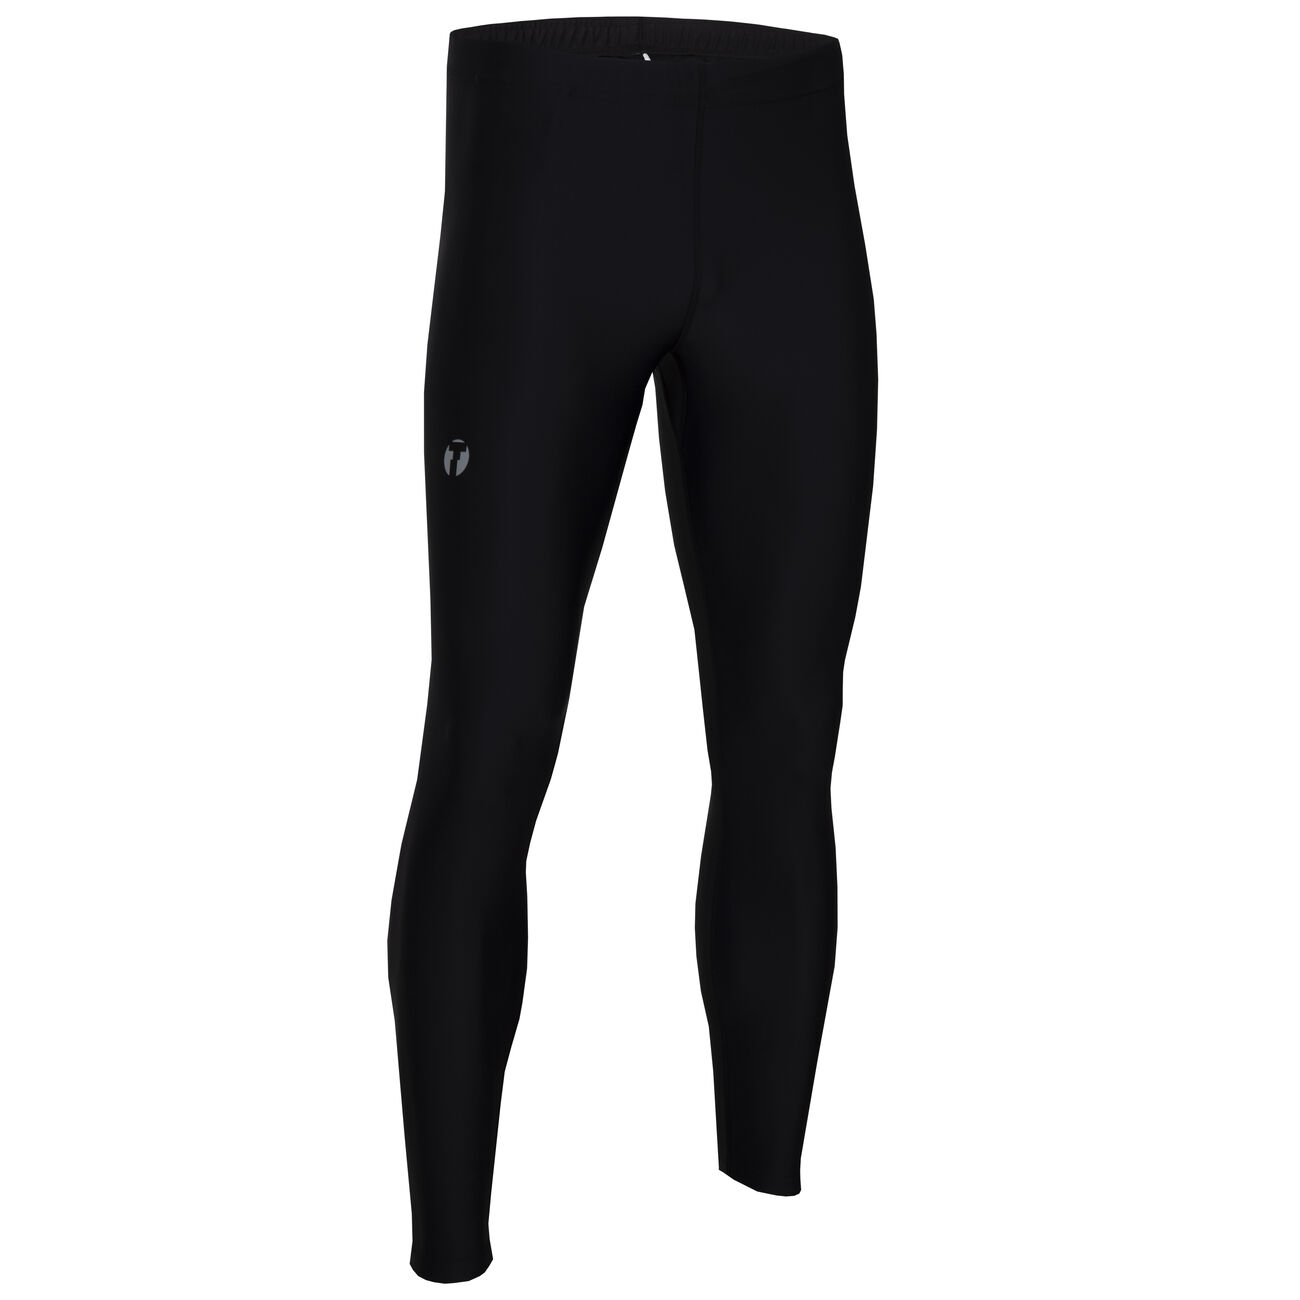 Adapt tights men's